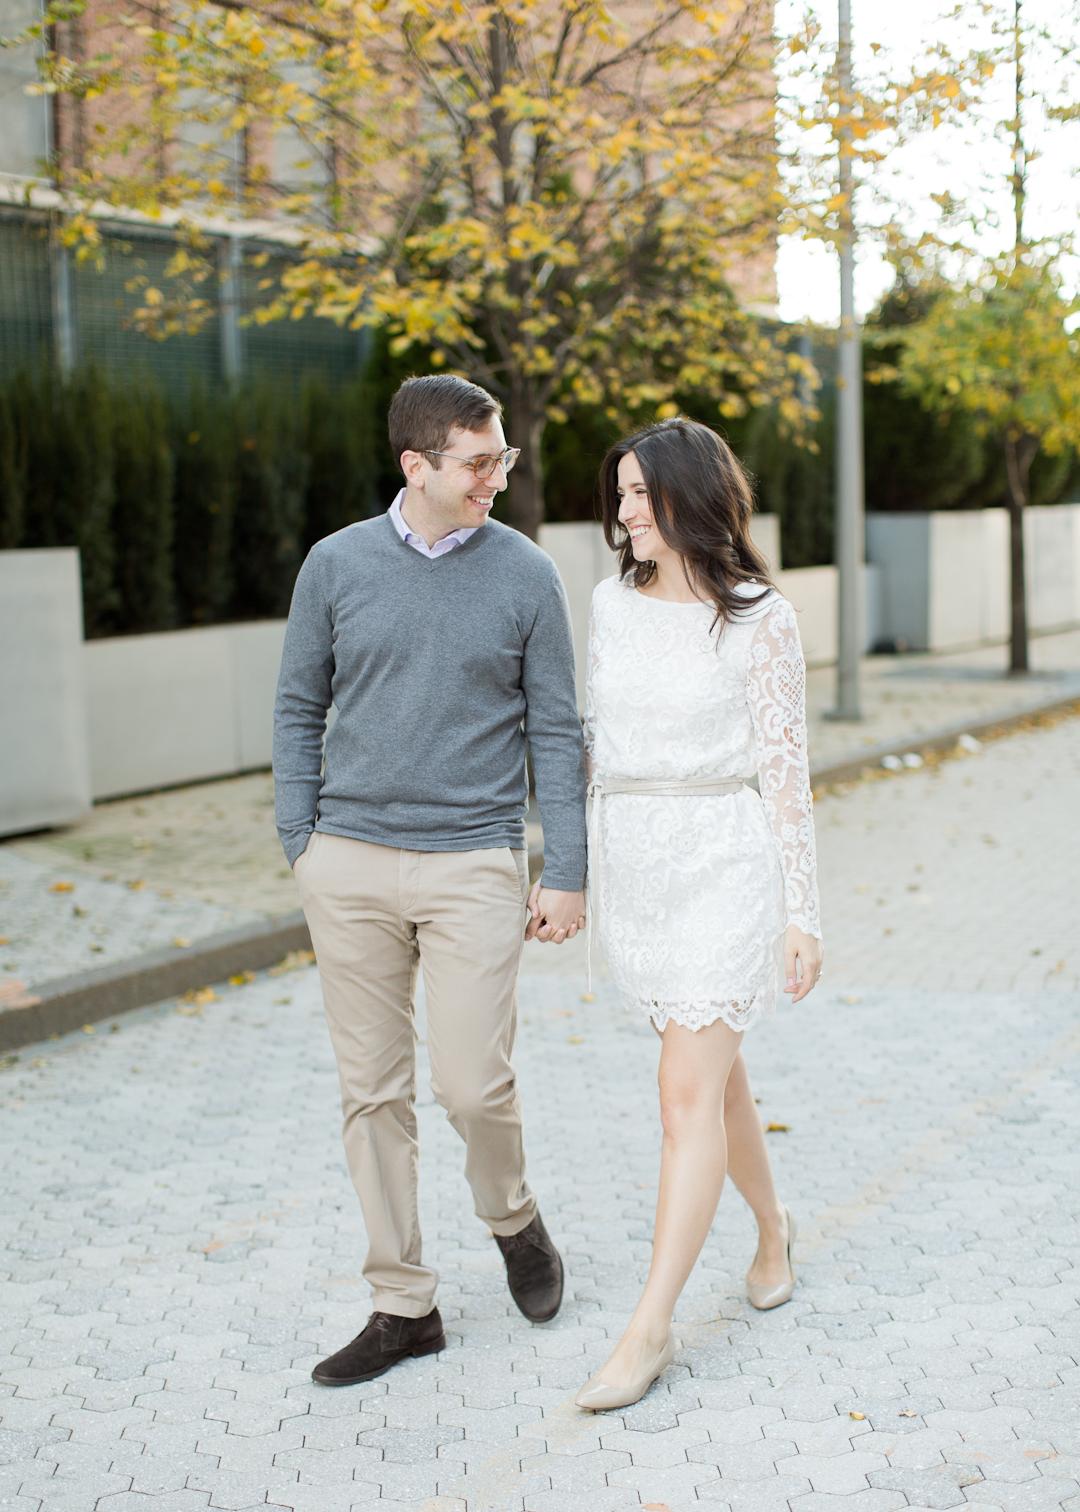 Melissa Kruse Photography - Christina & Alex Kips Bay Engagement Photos-50.jpg